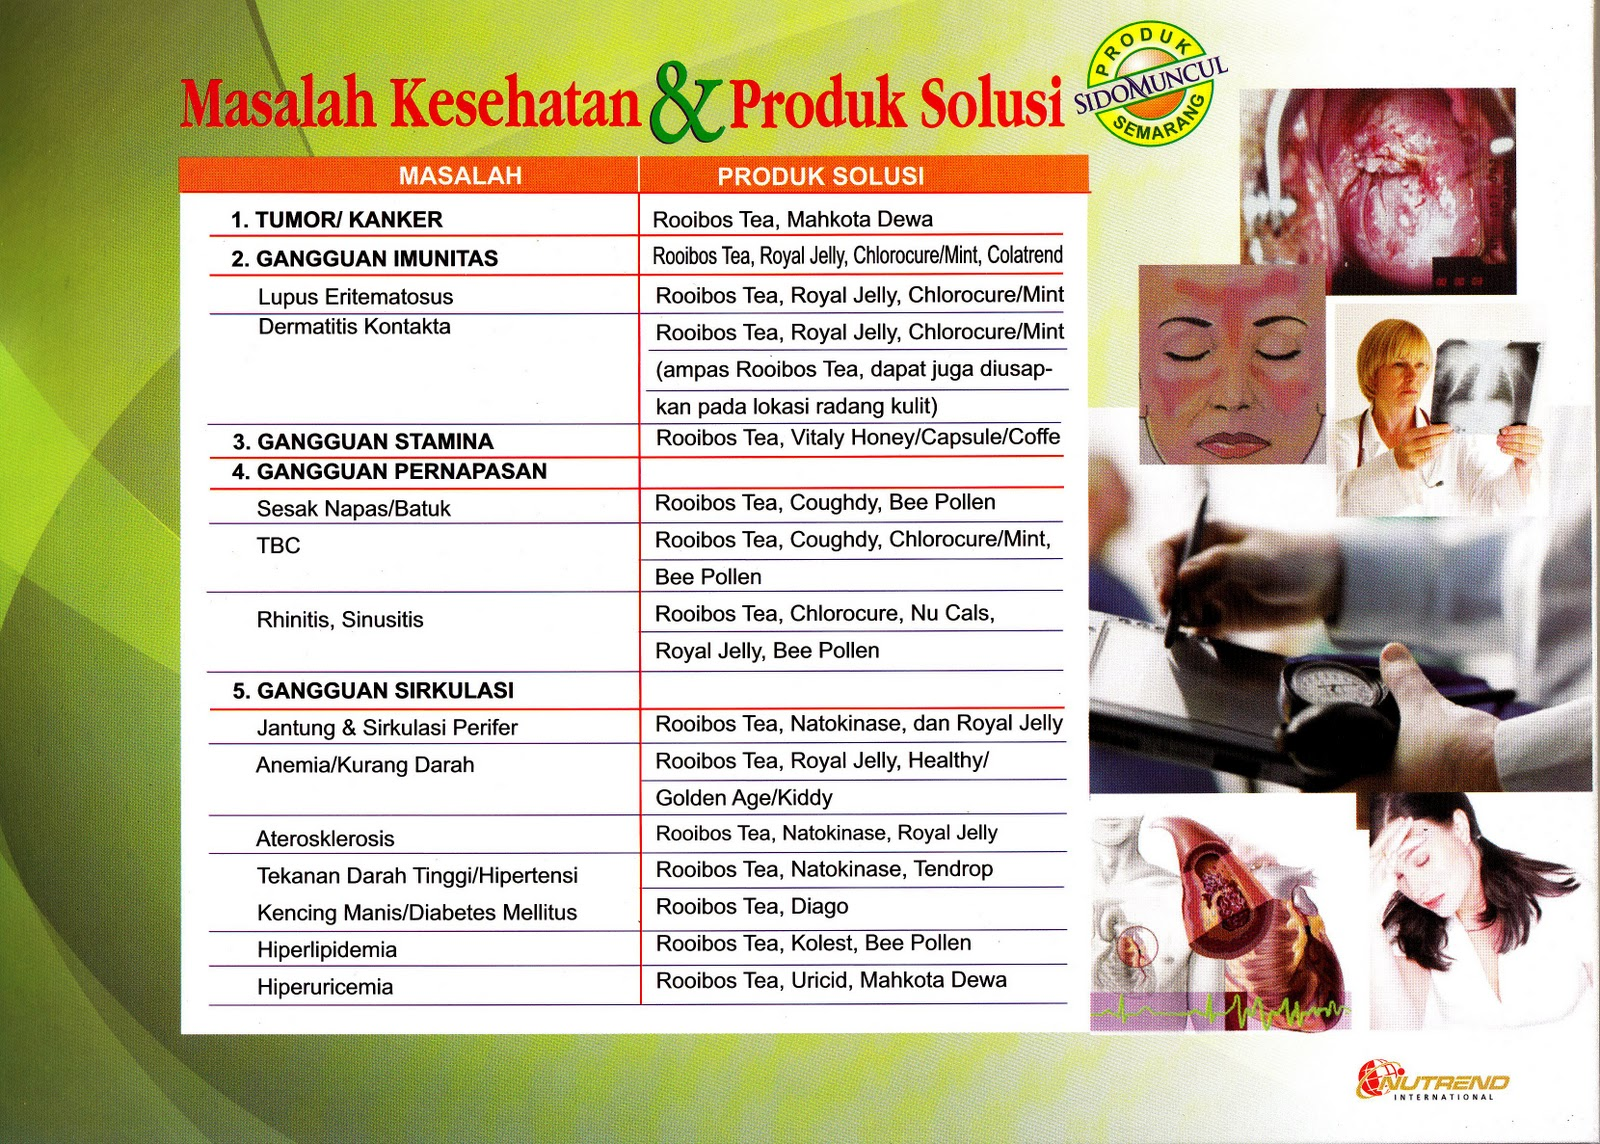 strategi produk international Produk: otomotif, jasa keuangan, alat berat,  astra international (idx: asii) merupakan perusahaan multinasional diversifikasi yang bermarkas di jakarta, indonesia.